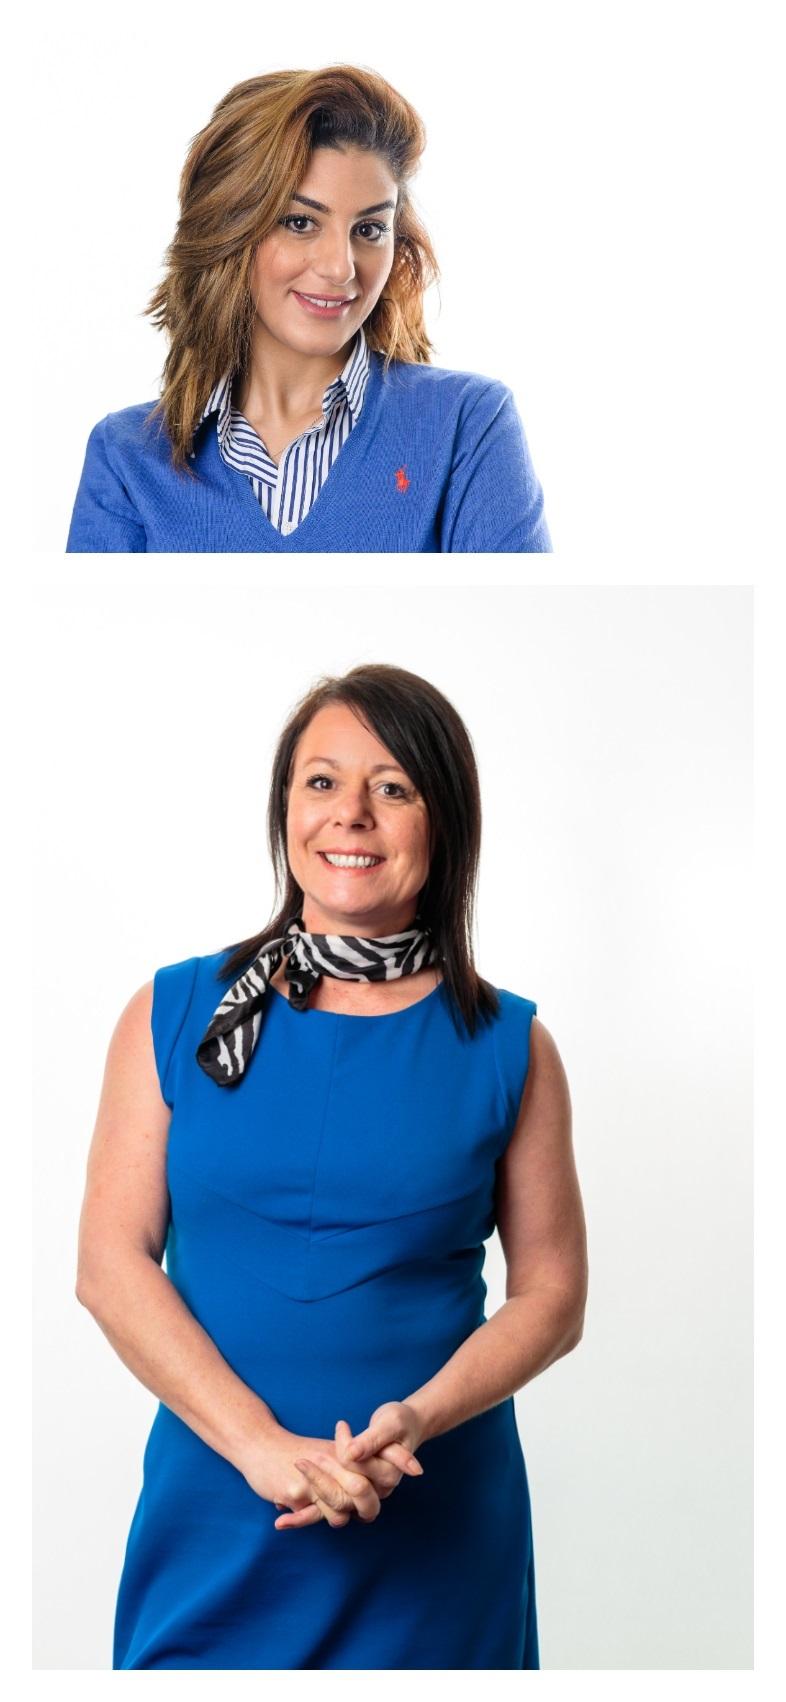 Business Head shots Portrait photography Birmingham Midlands Warwickshire UK by Chris Fossey 1